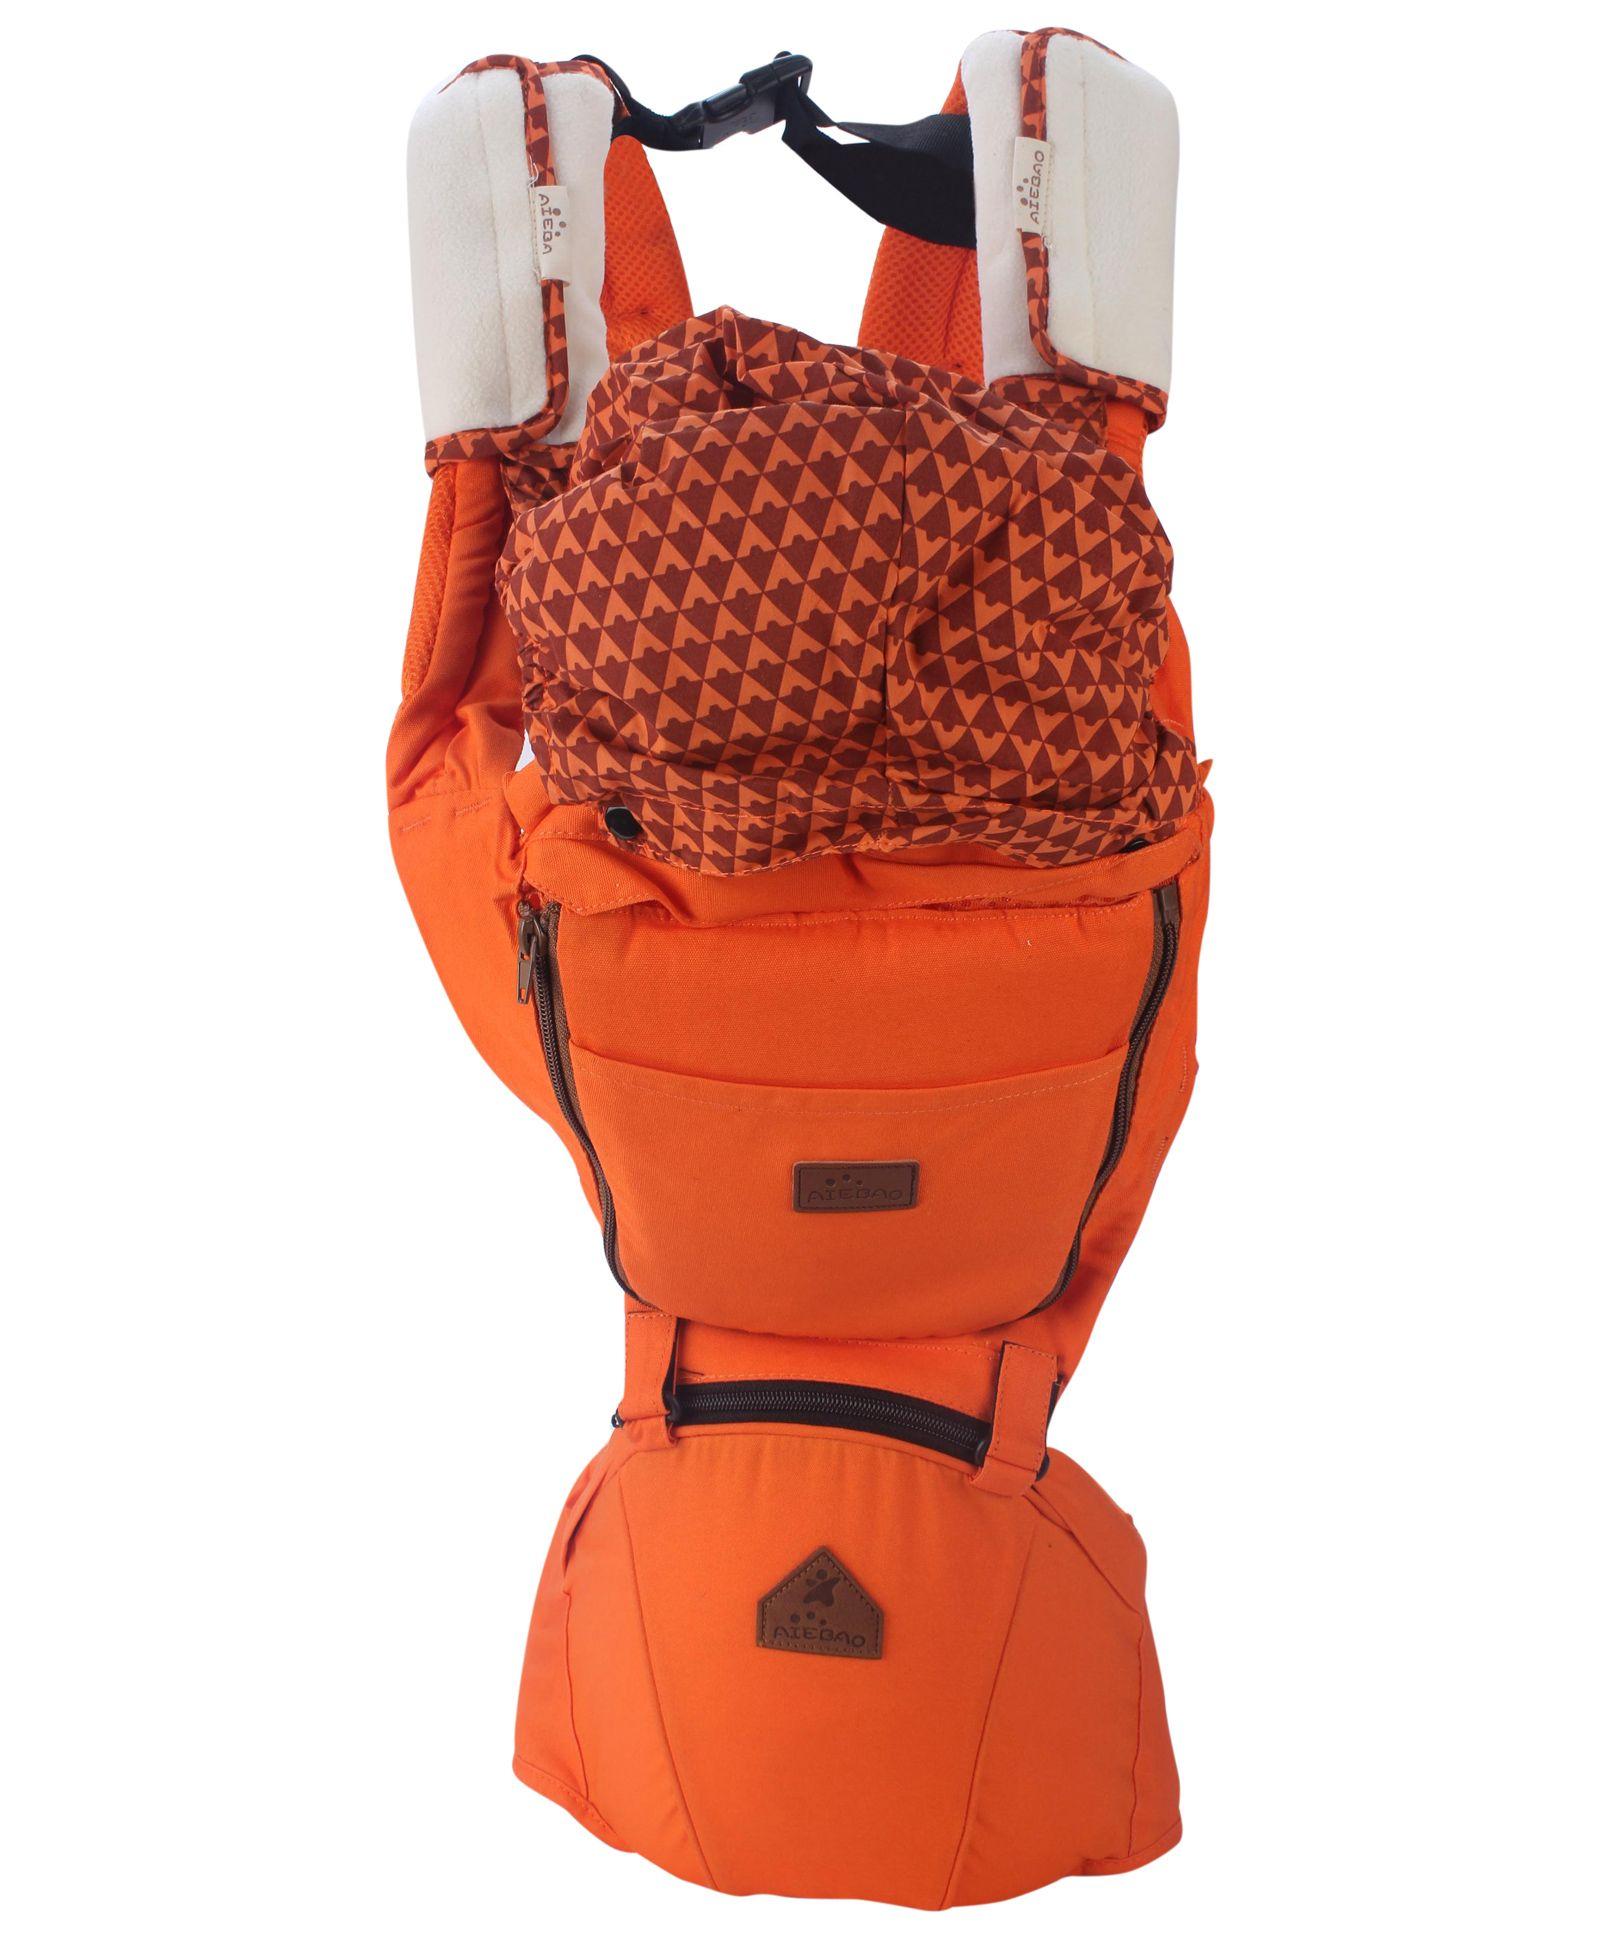 3 Way Baby Carrier - Orange